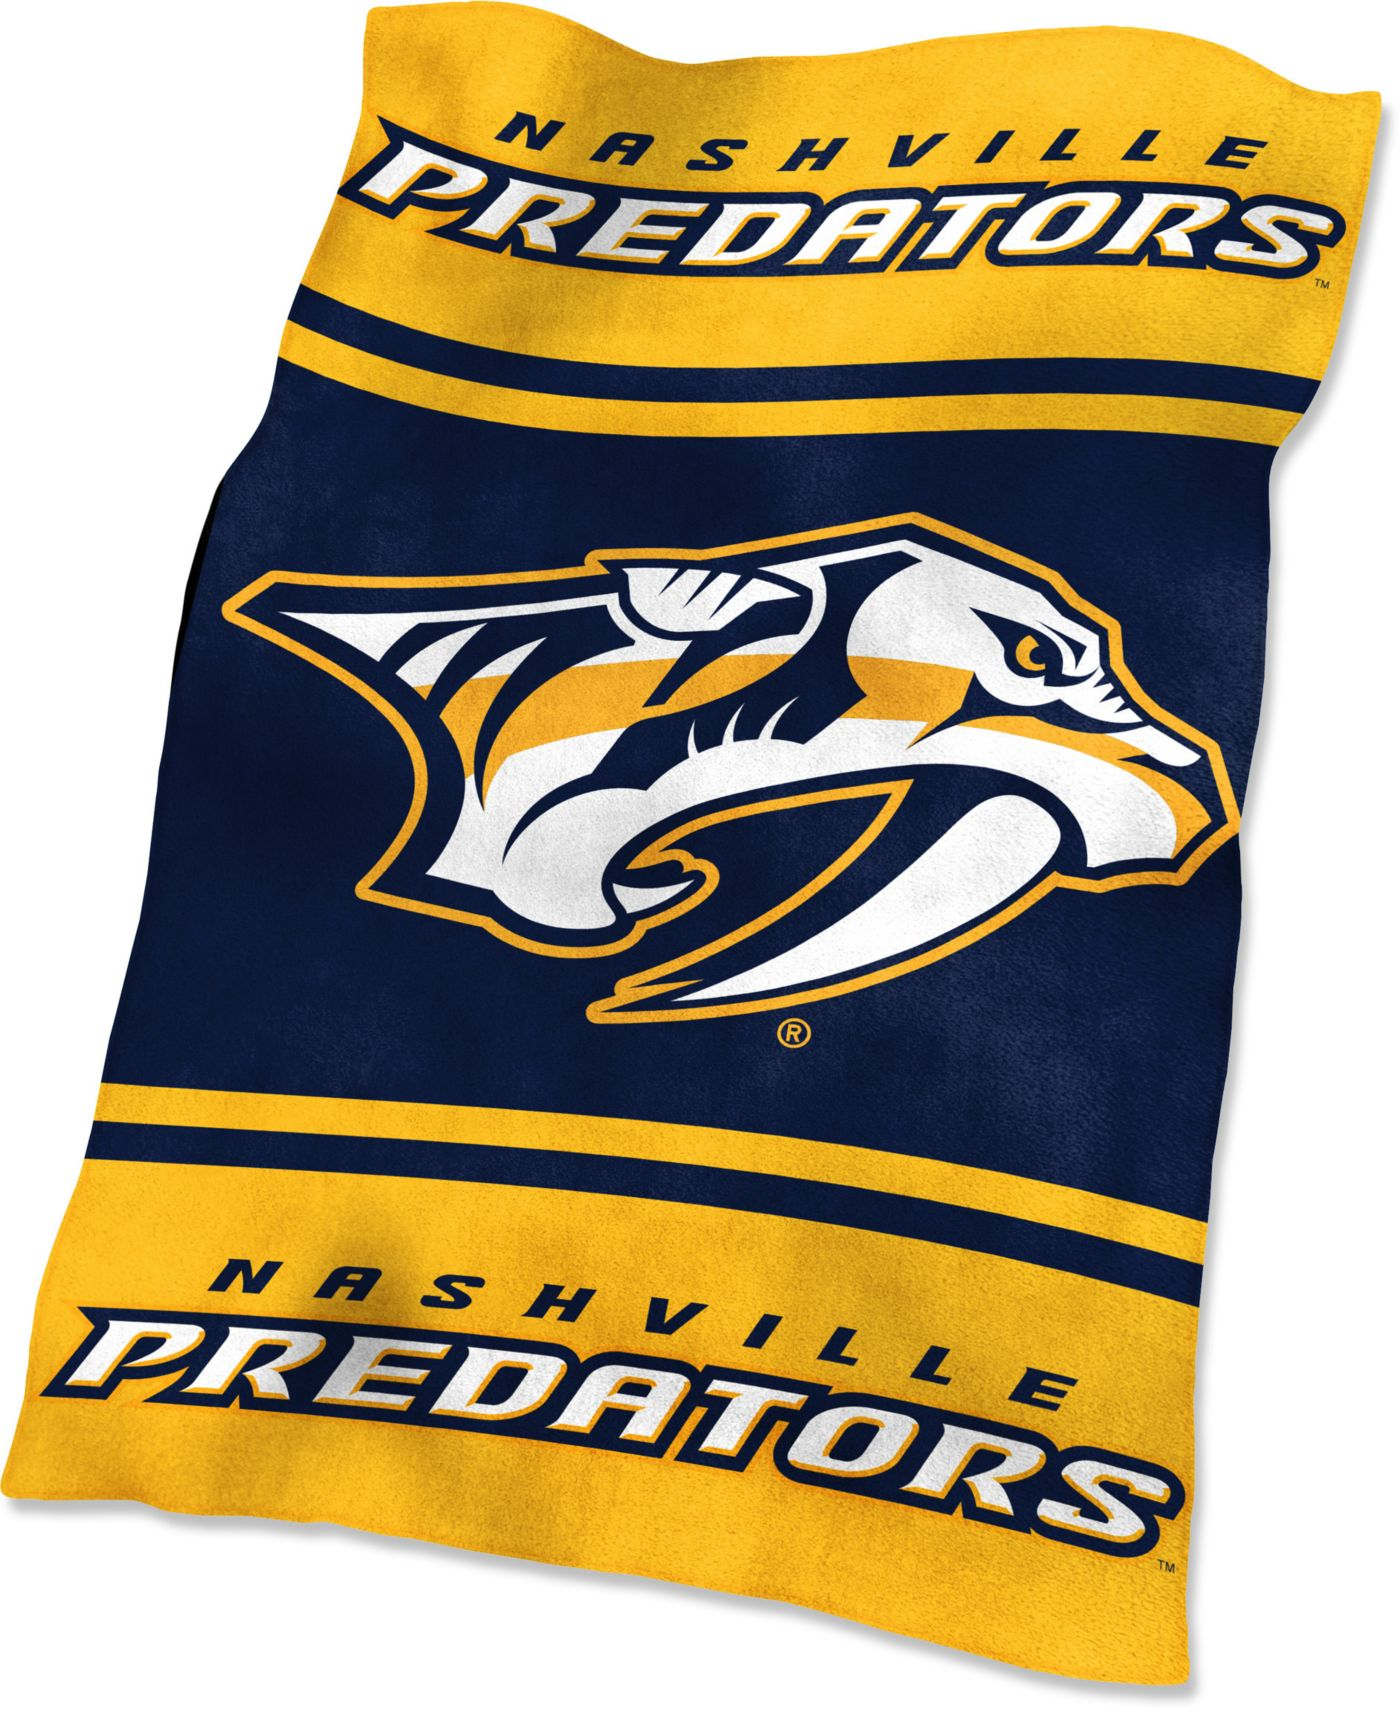 Nashville Predators Ultrasoft Blanket